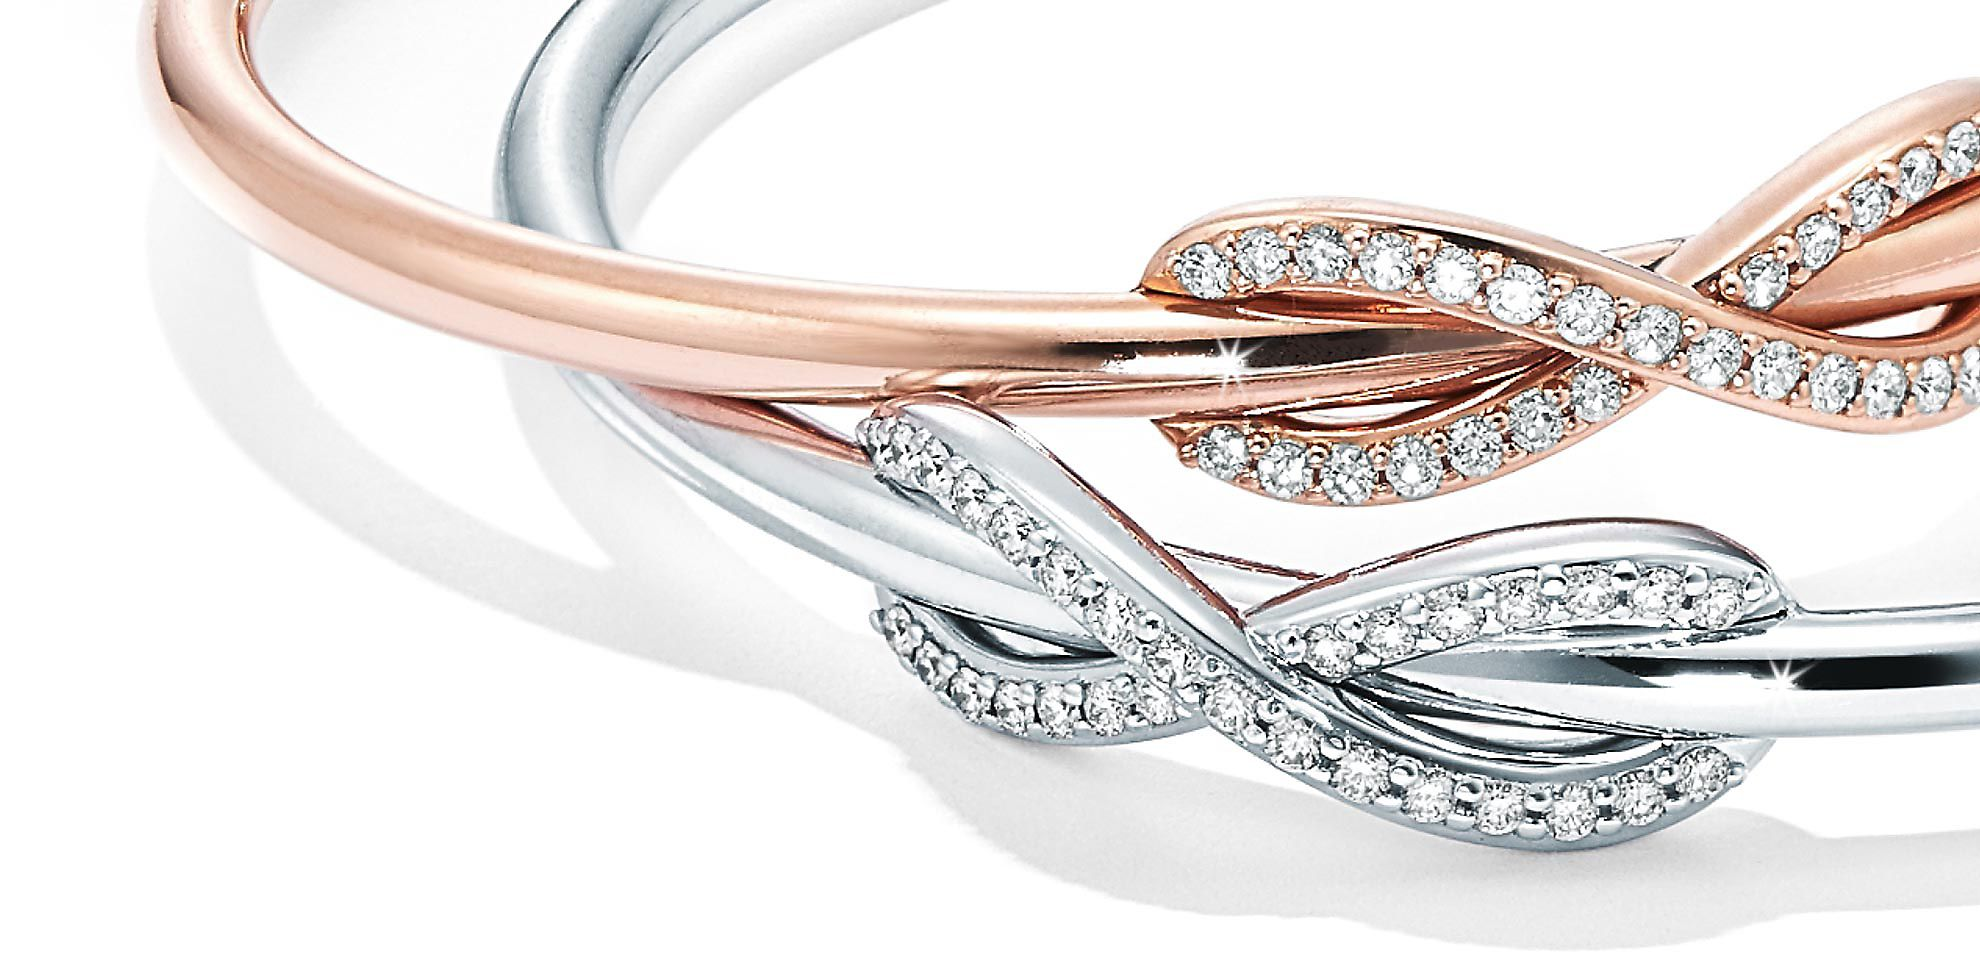 Tiffany Infinity Unendlichkeit Ketten Ringe Armband Tiffany Co